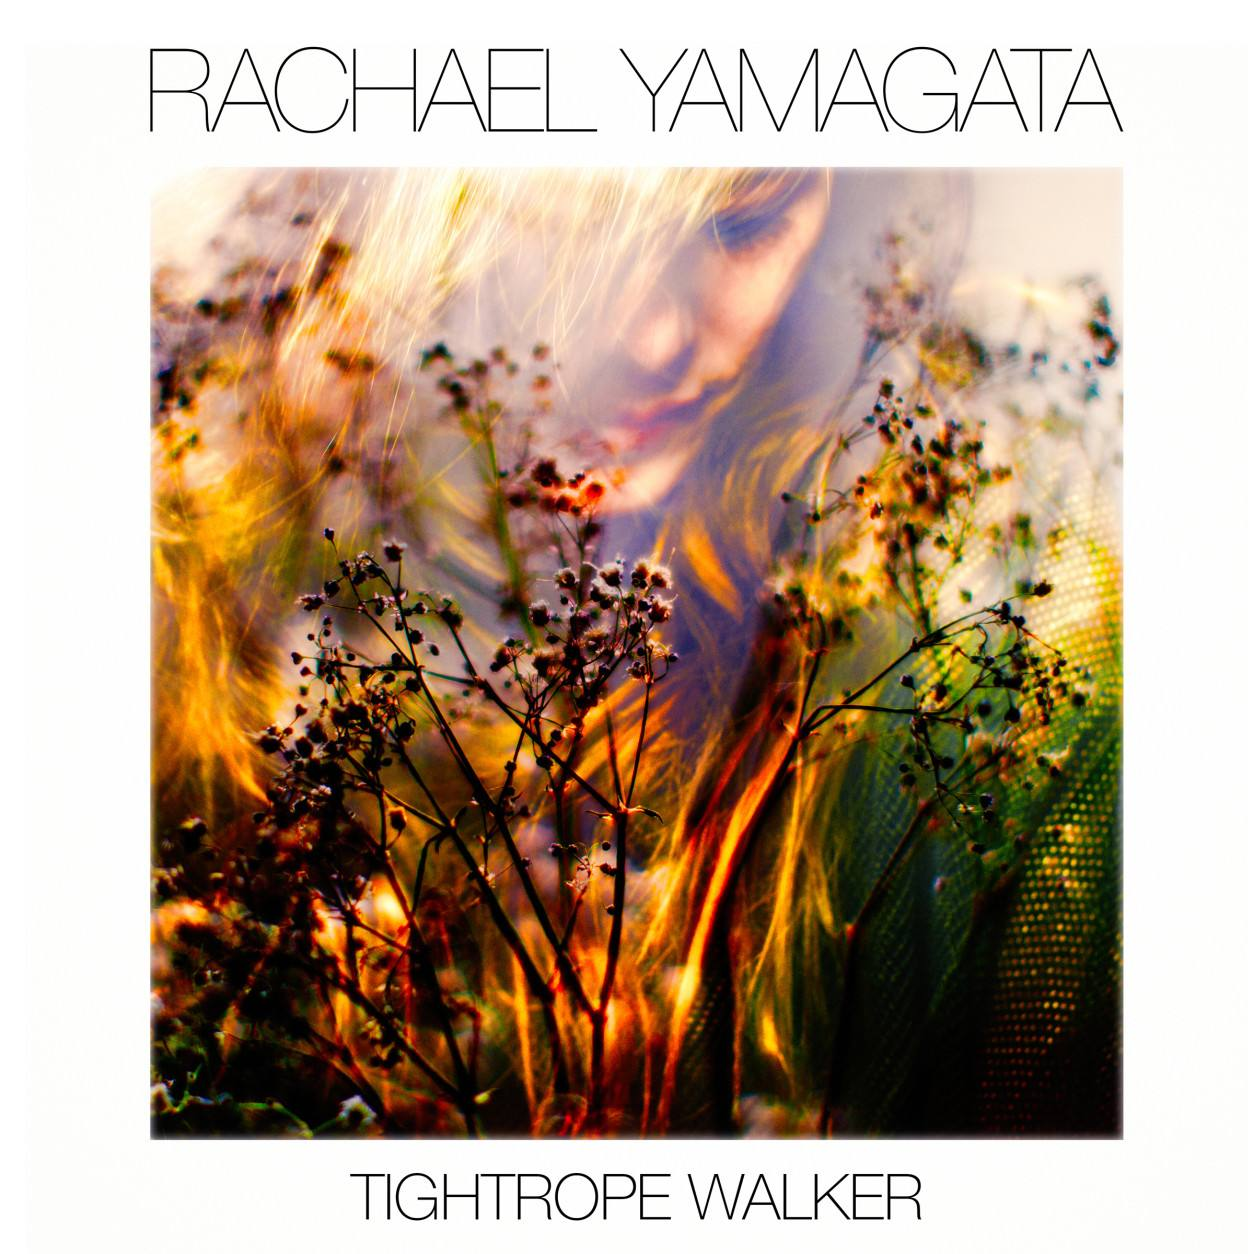 Rachael Yamagata - Tightrope Walker artwork